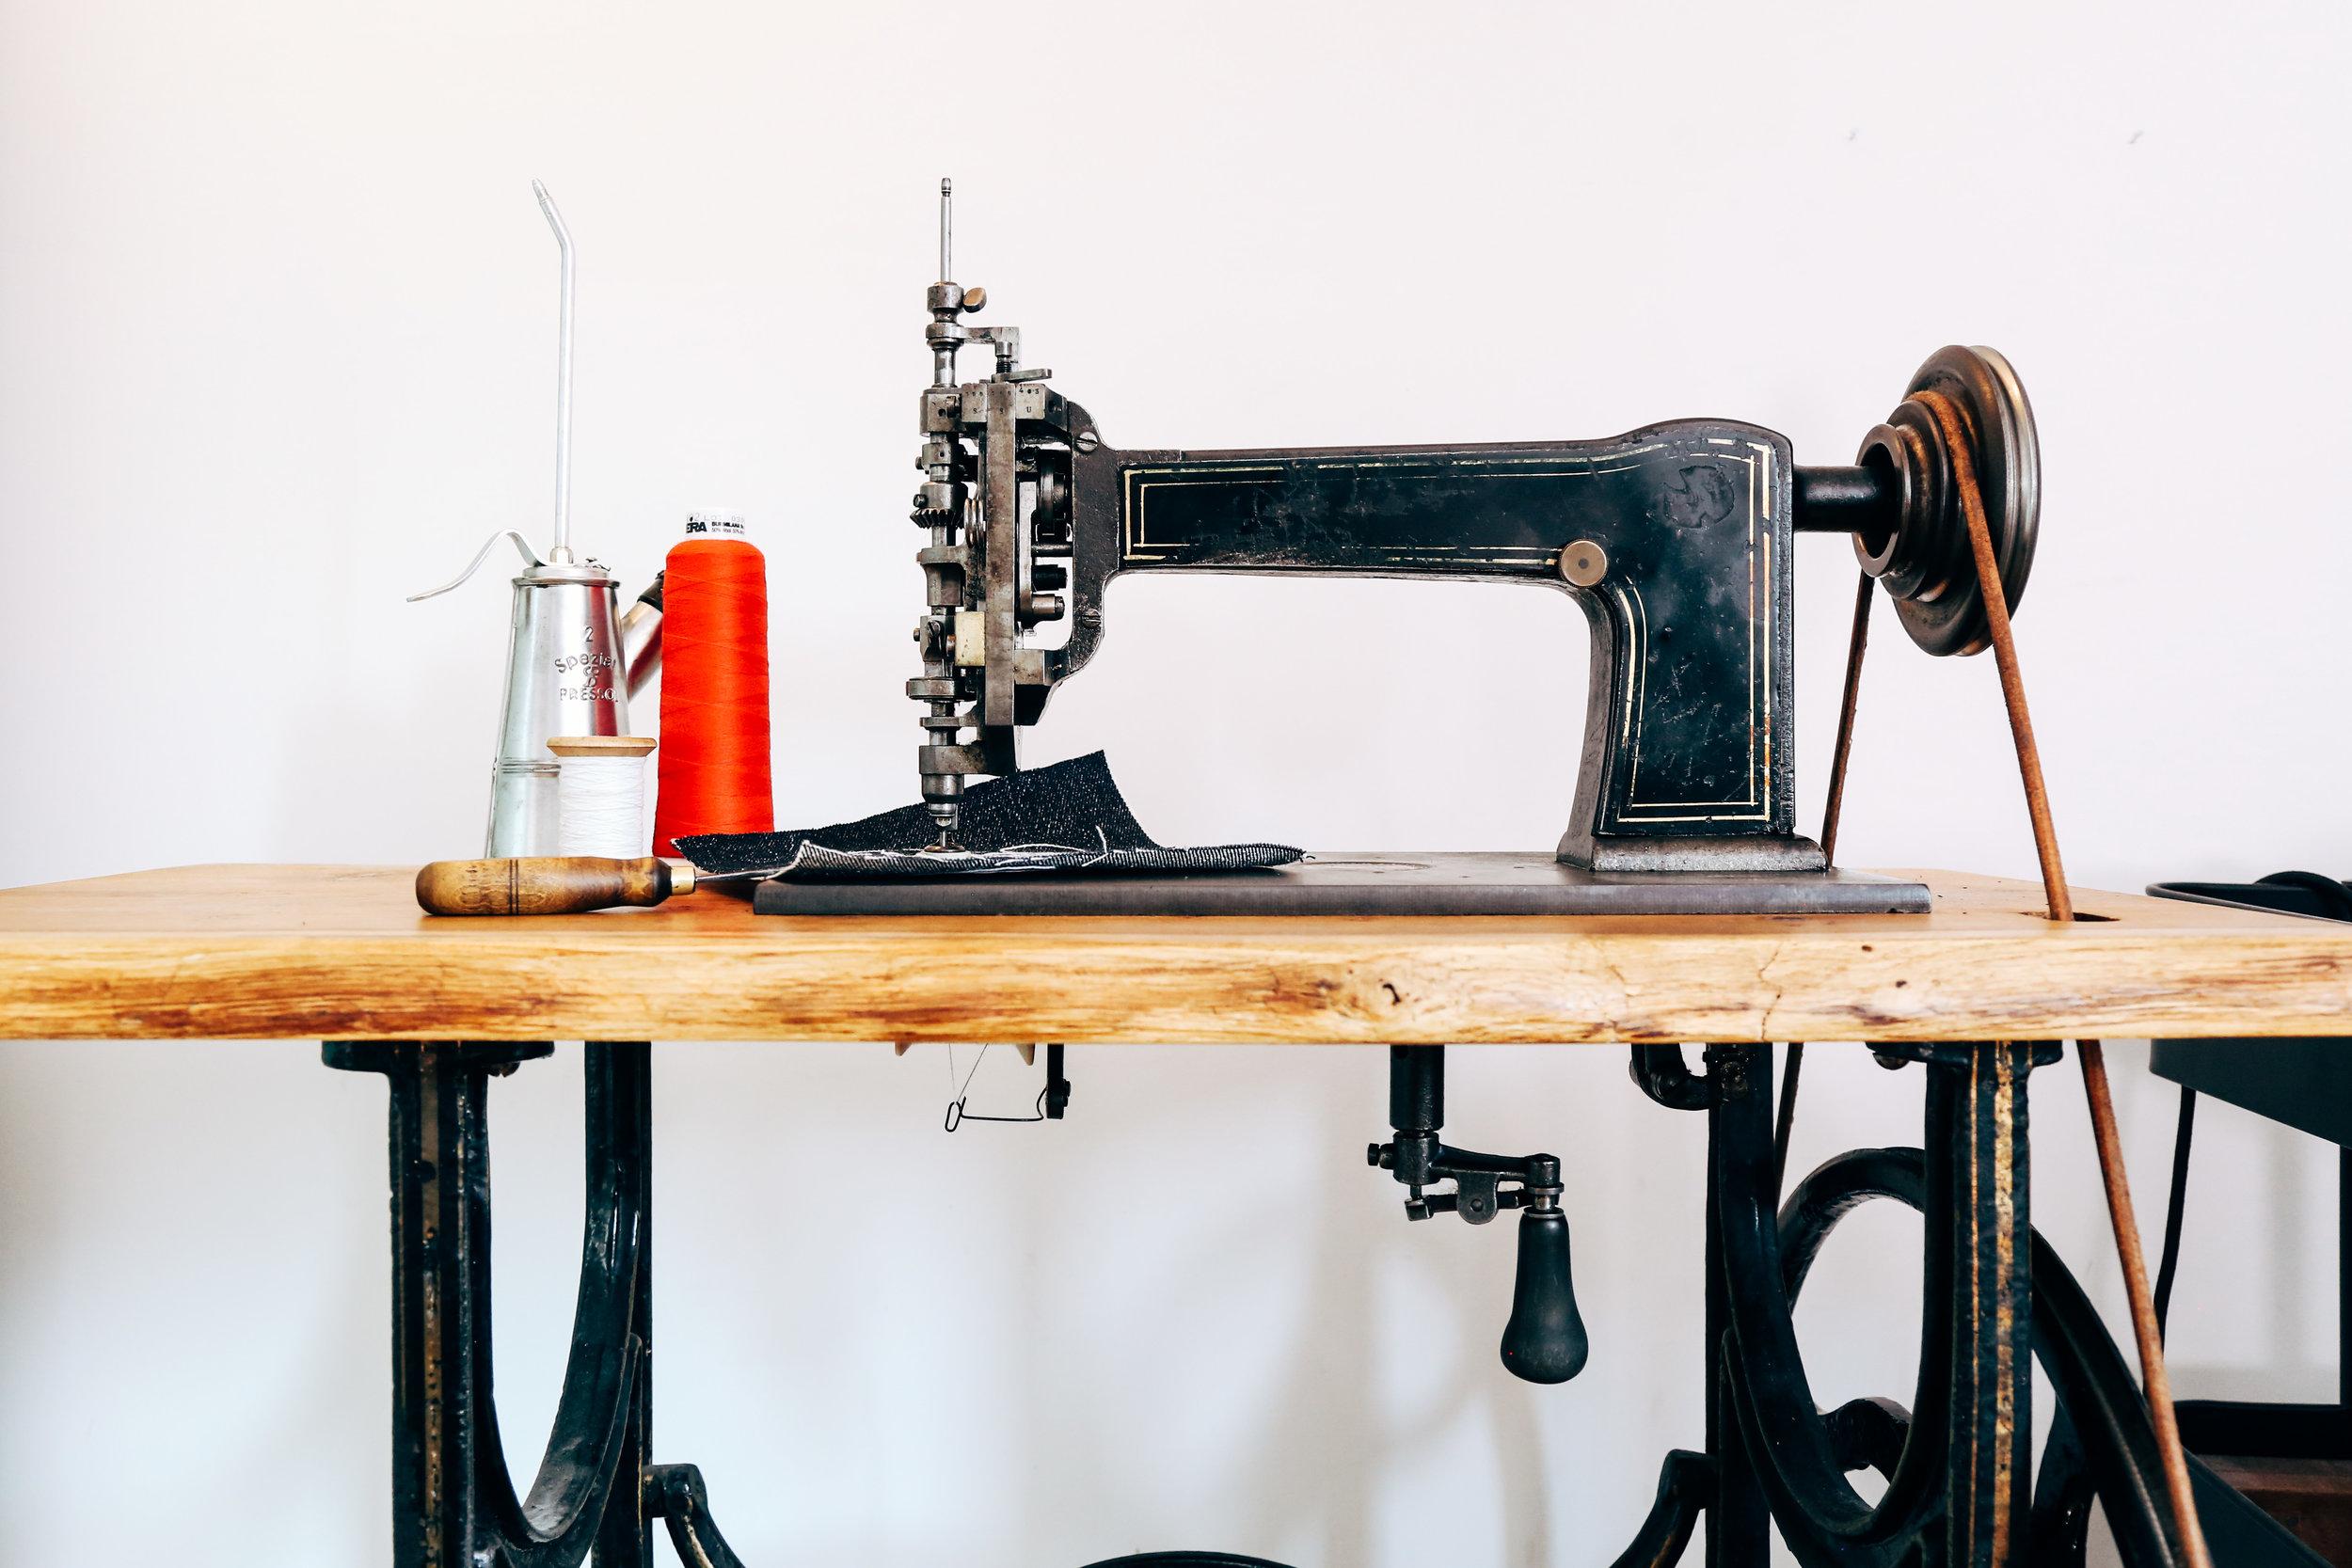 cornely-a-chainstitch-machine-chain-stitch-embroidery-saint-chains.jpg